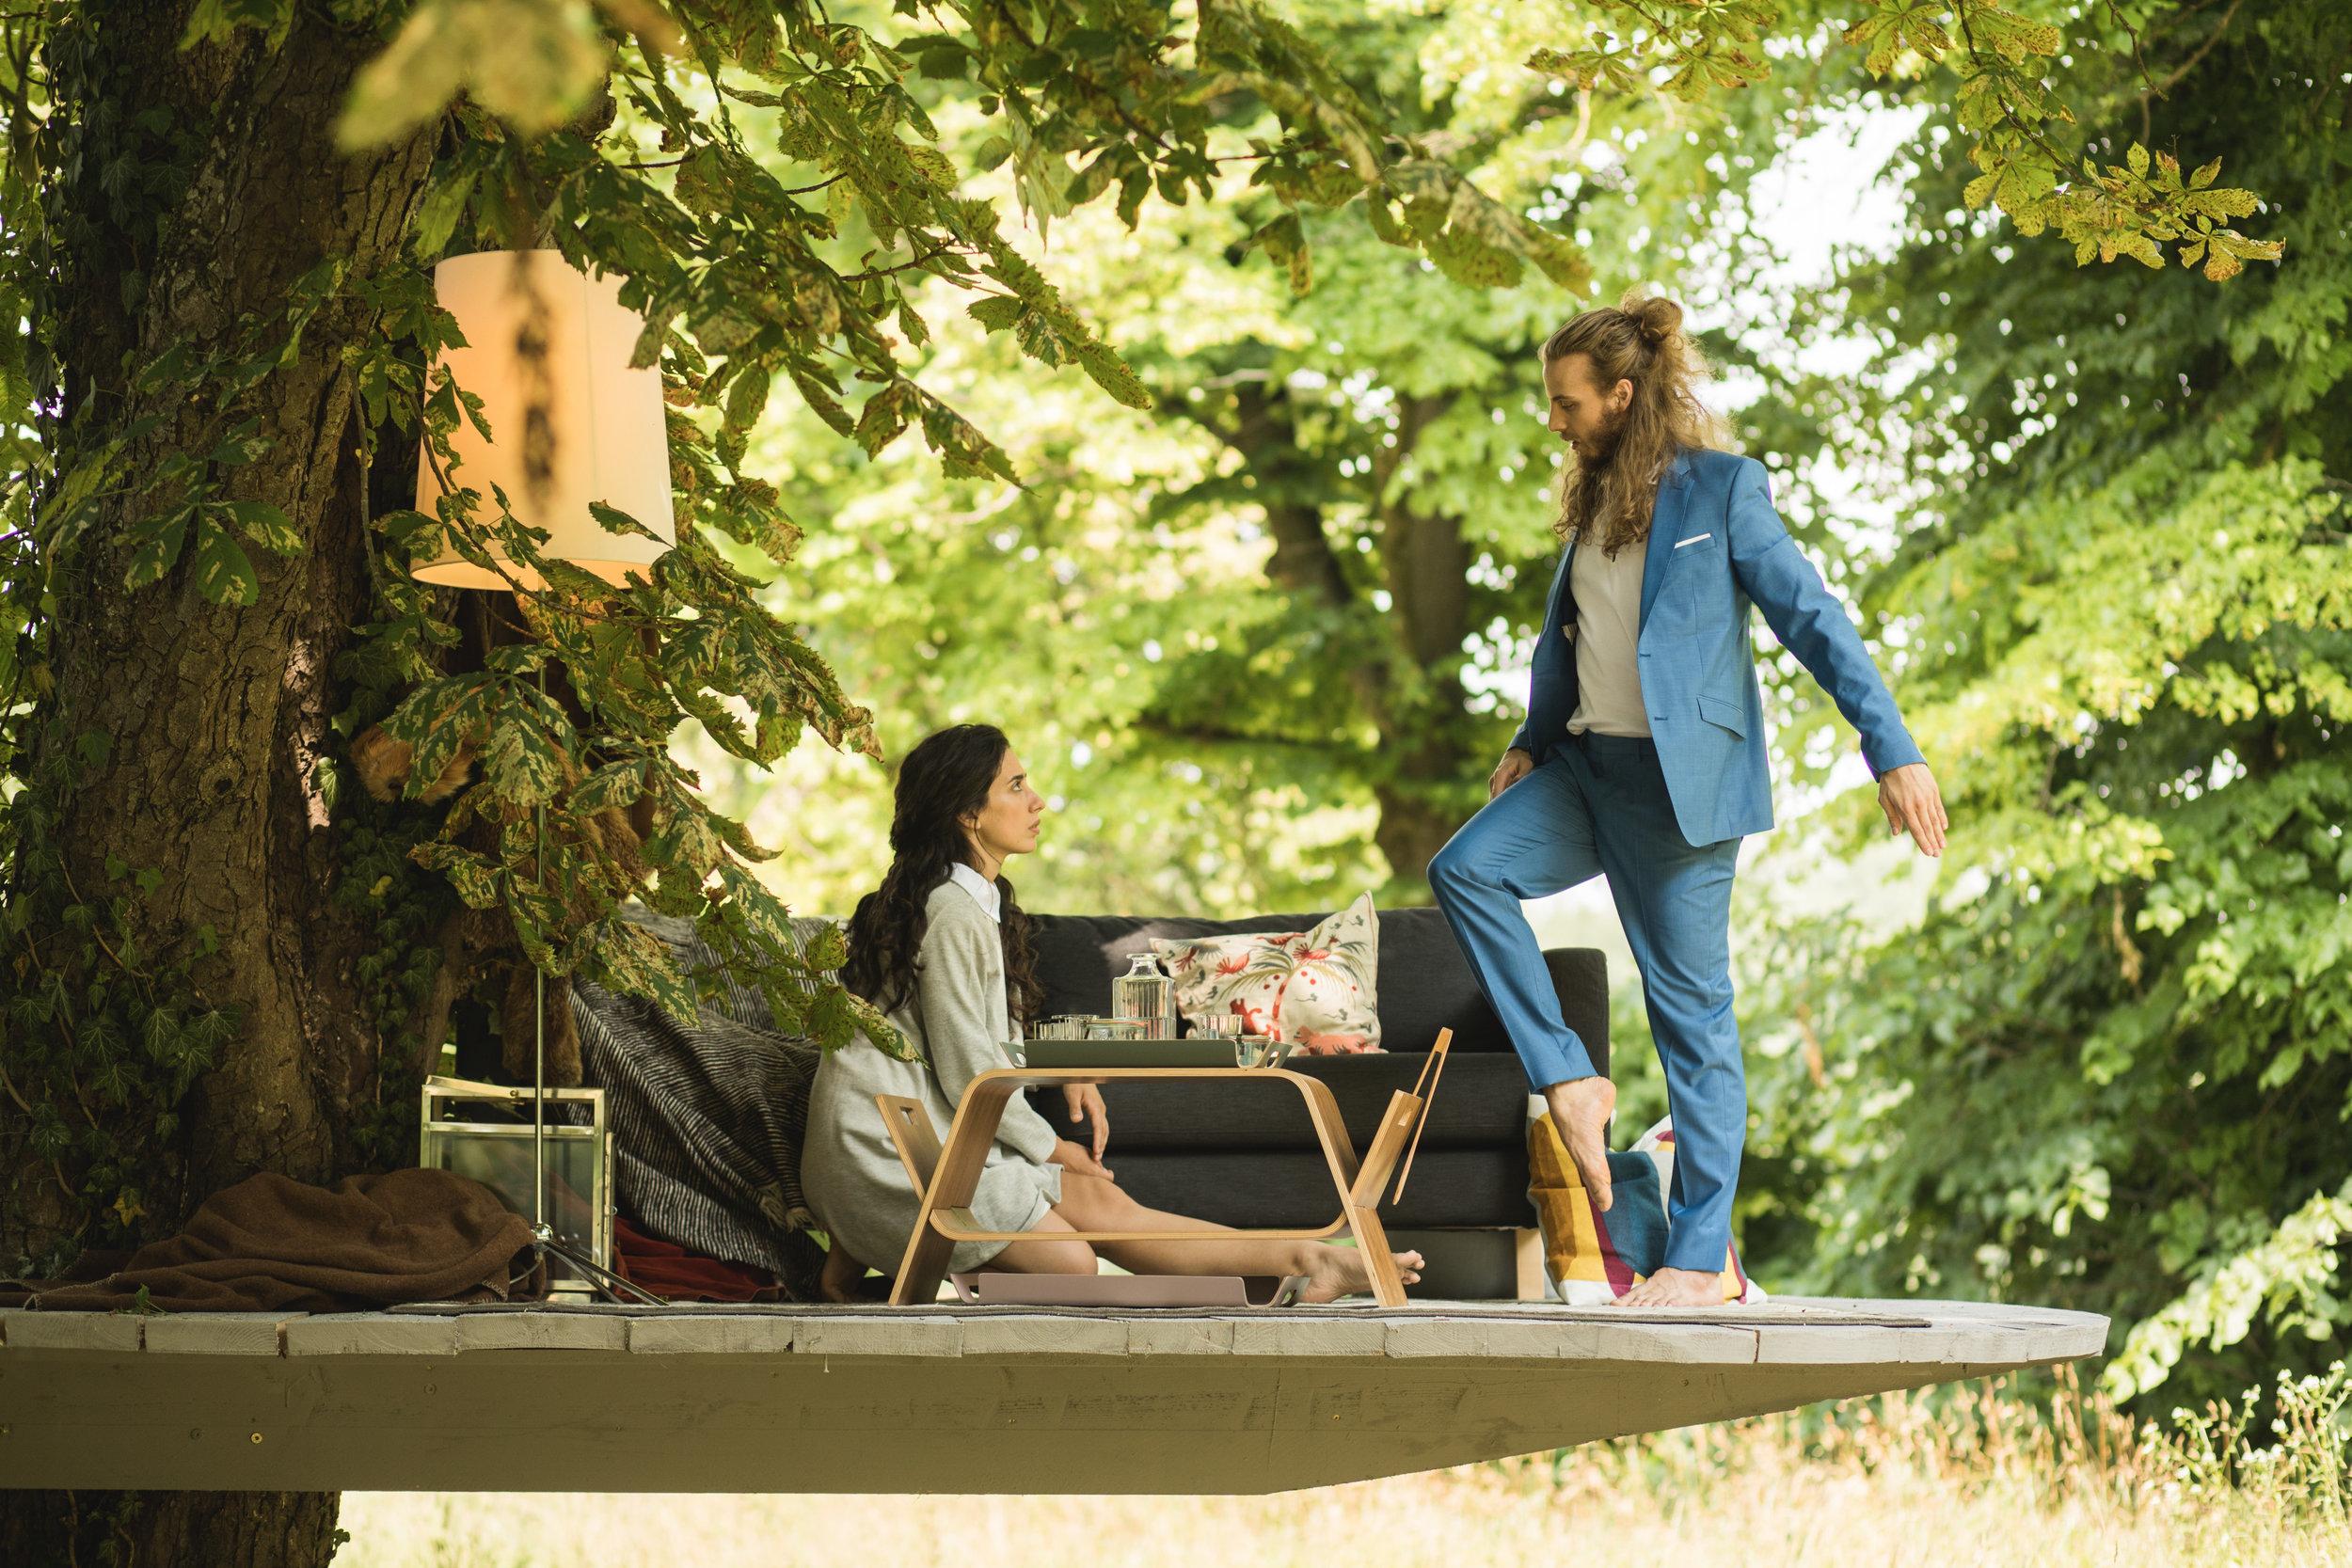 Paul (Sami Similä) and Franziska (Manuela Calleja Valderama) at the tree house © Wolfgang Lienbacher